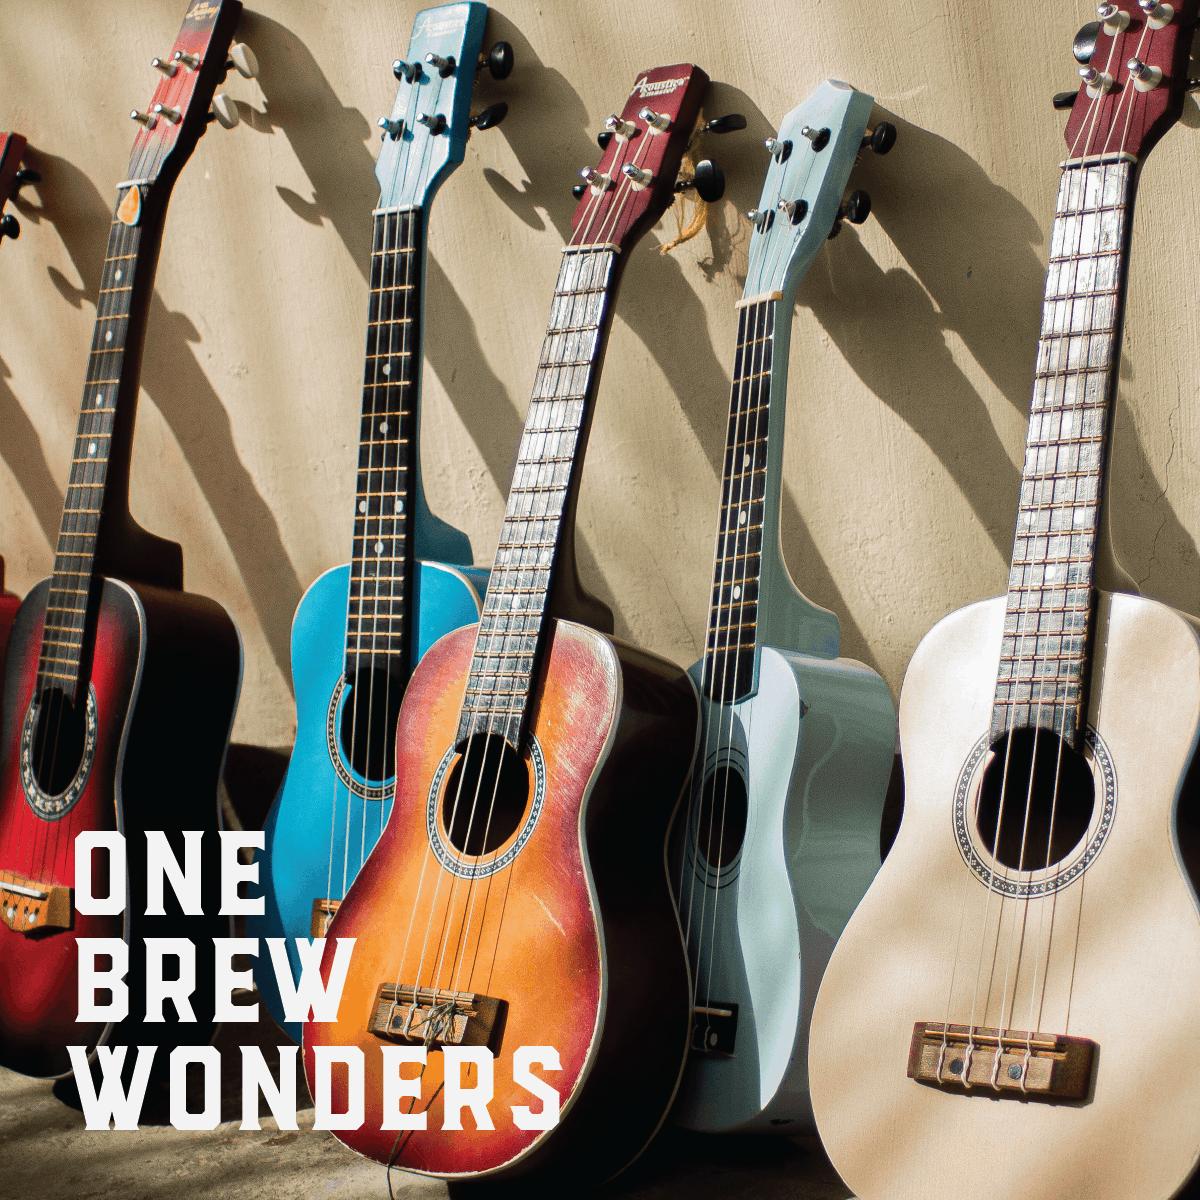 https://mygrovebrewhouse.com/wp-content/uploads/2021/03/One-Brew-Wonder-01-01.png